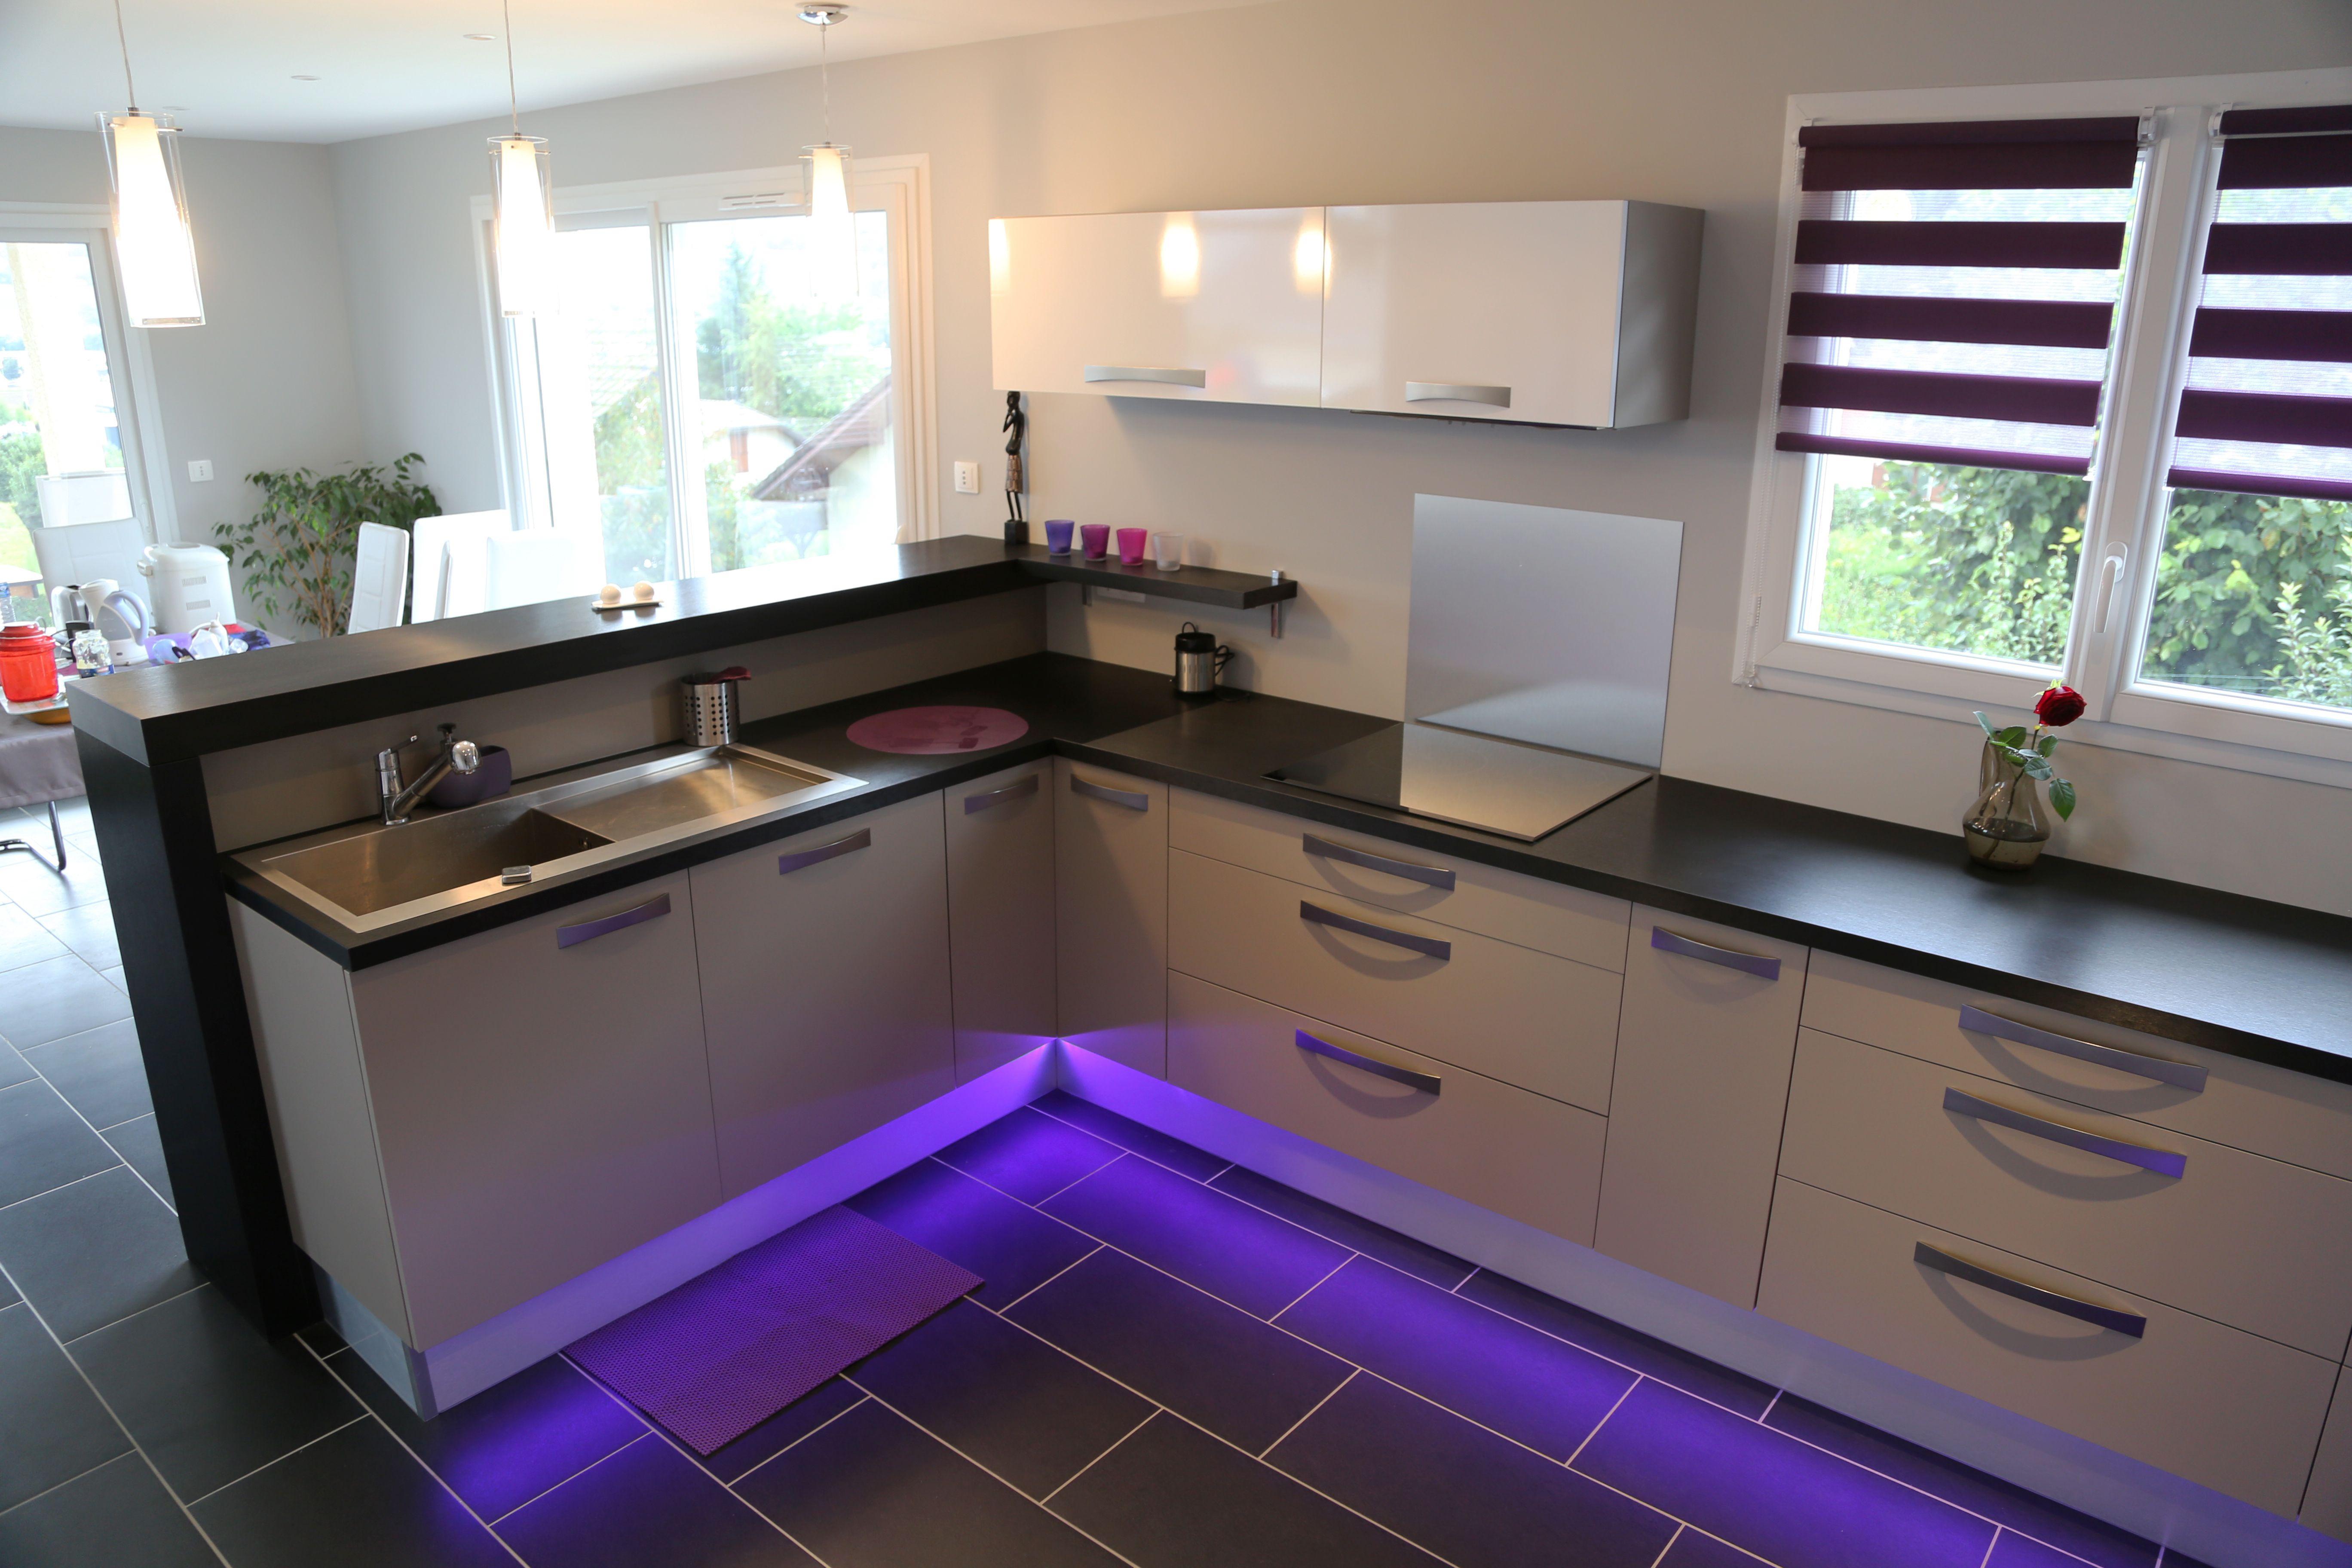 cas o vente et pose de menuiseries et cuisines sur mesure cas o. Black Bedroom Furniture Sets. Home Design Ideas